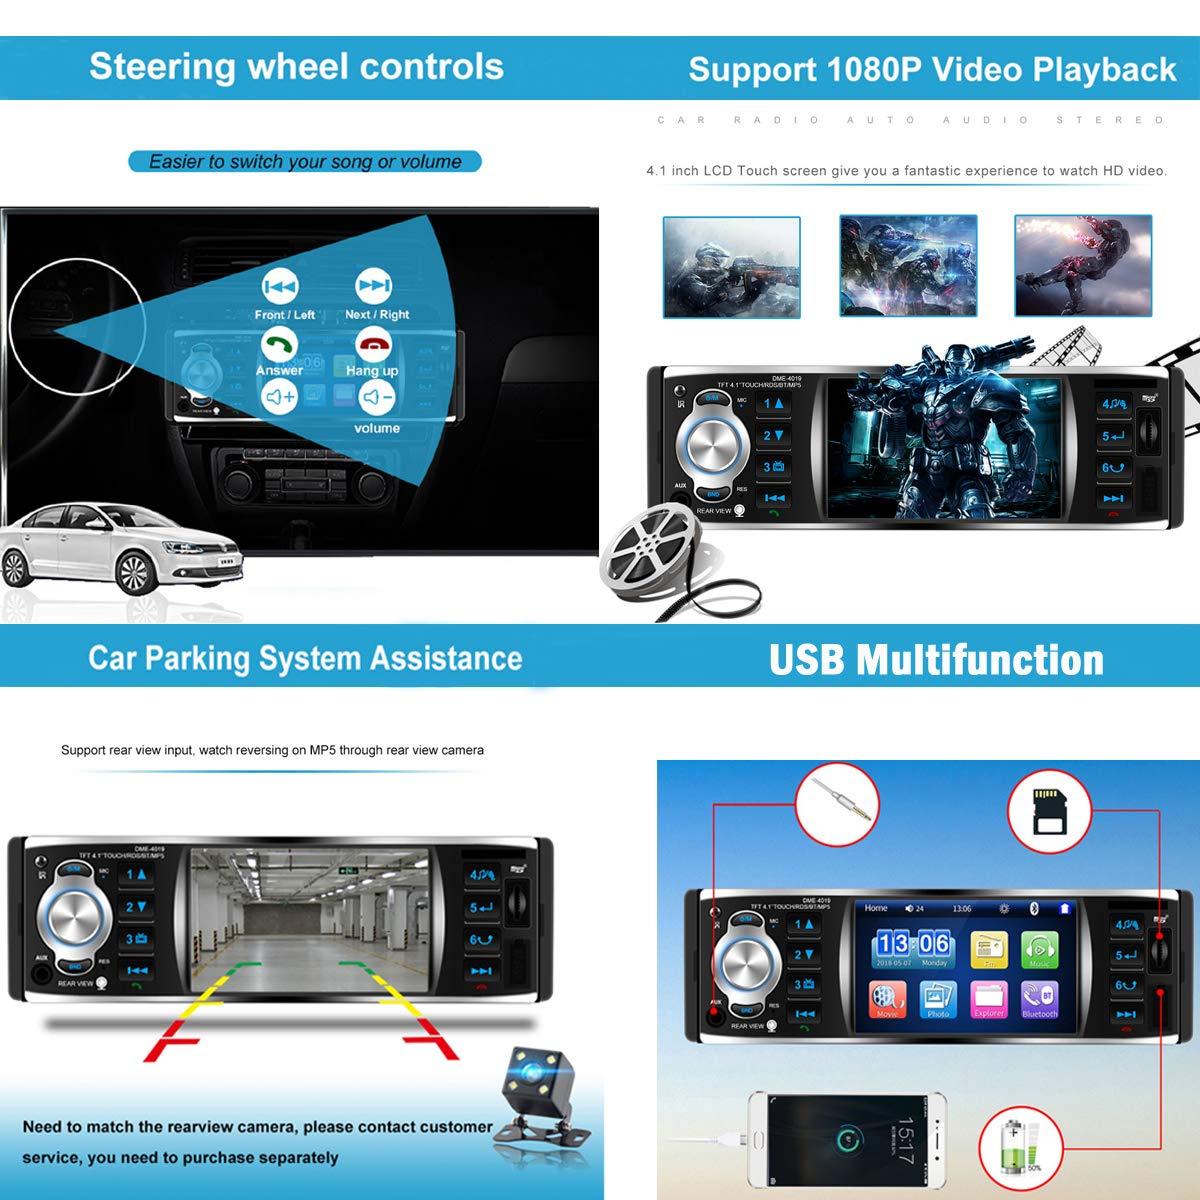 GOFORJUMP Autoradio-Autoradio 1 Din 12v 4,1-Zoll-Touchscreen Auto-Audio-Spiegel-Link RDS-Bluetooth-Autoradio